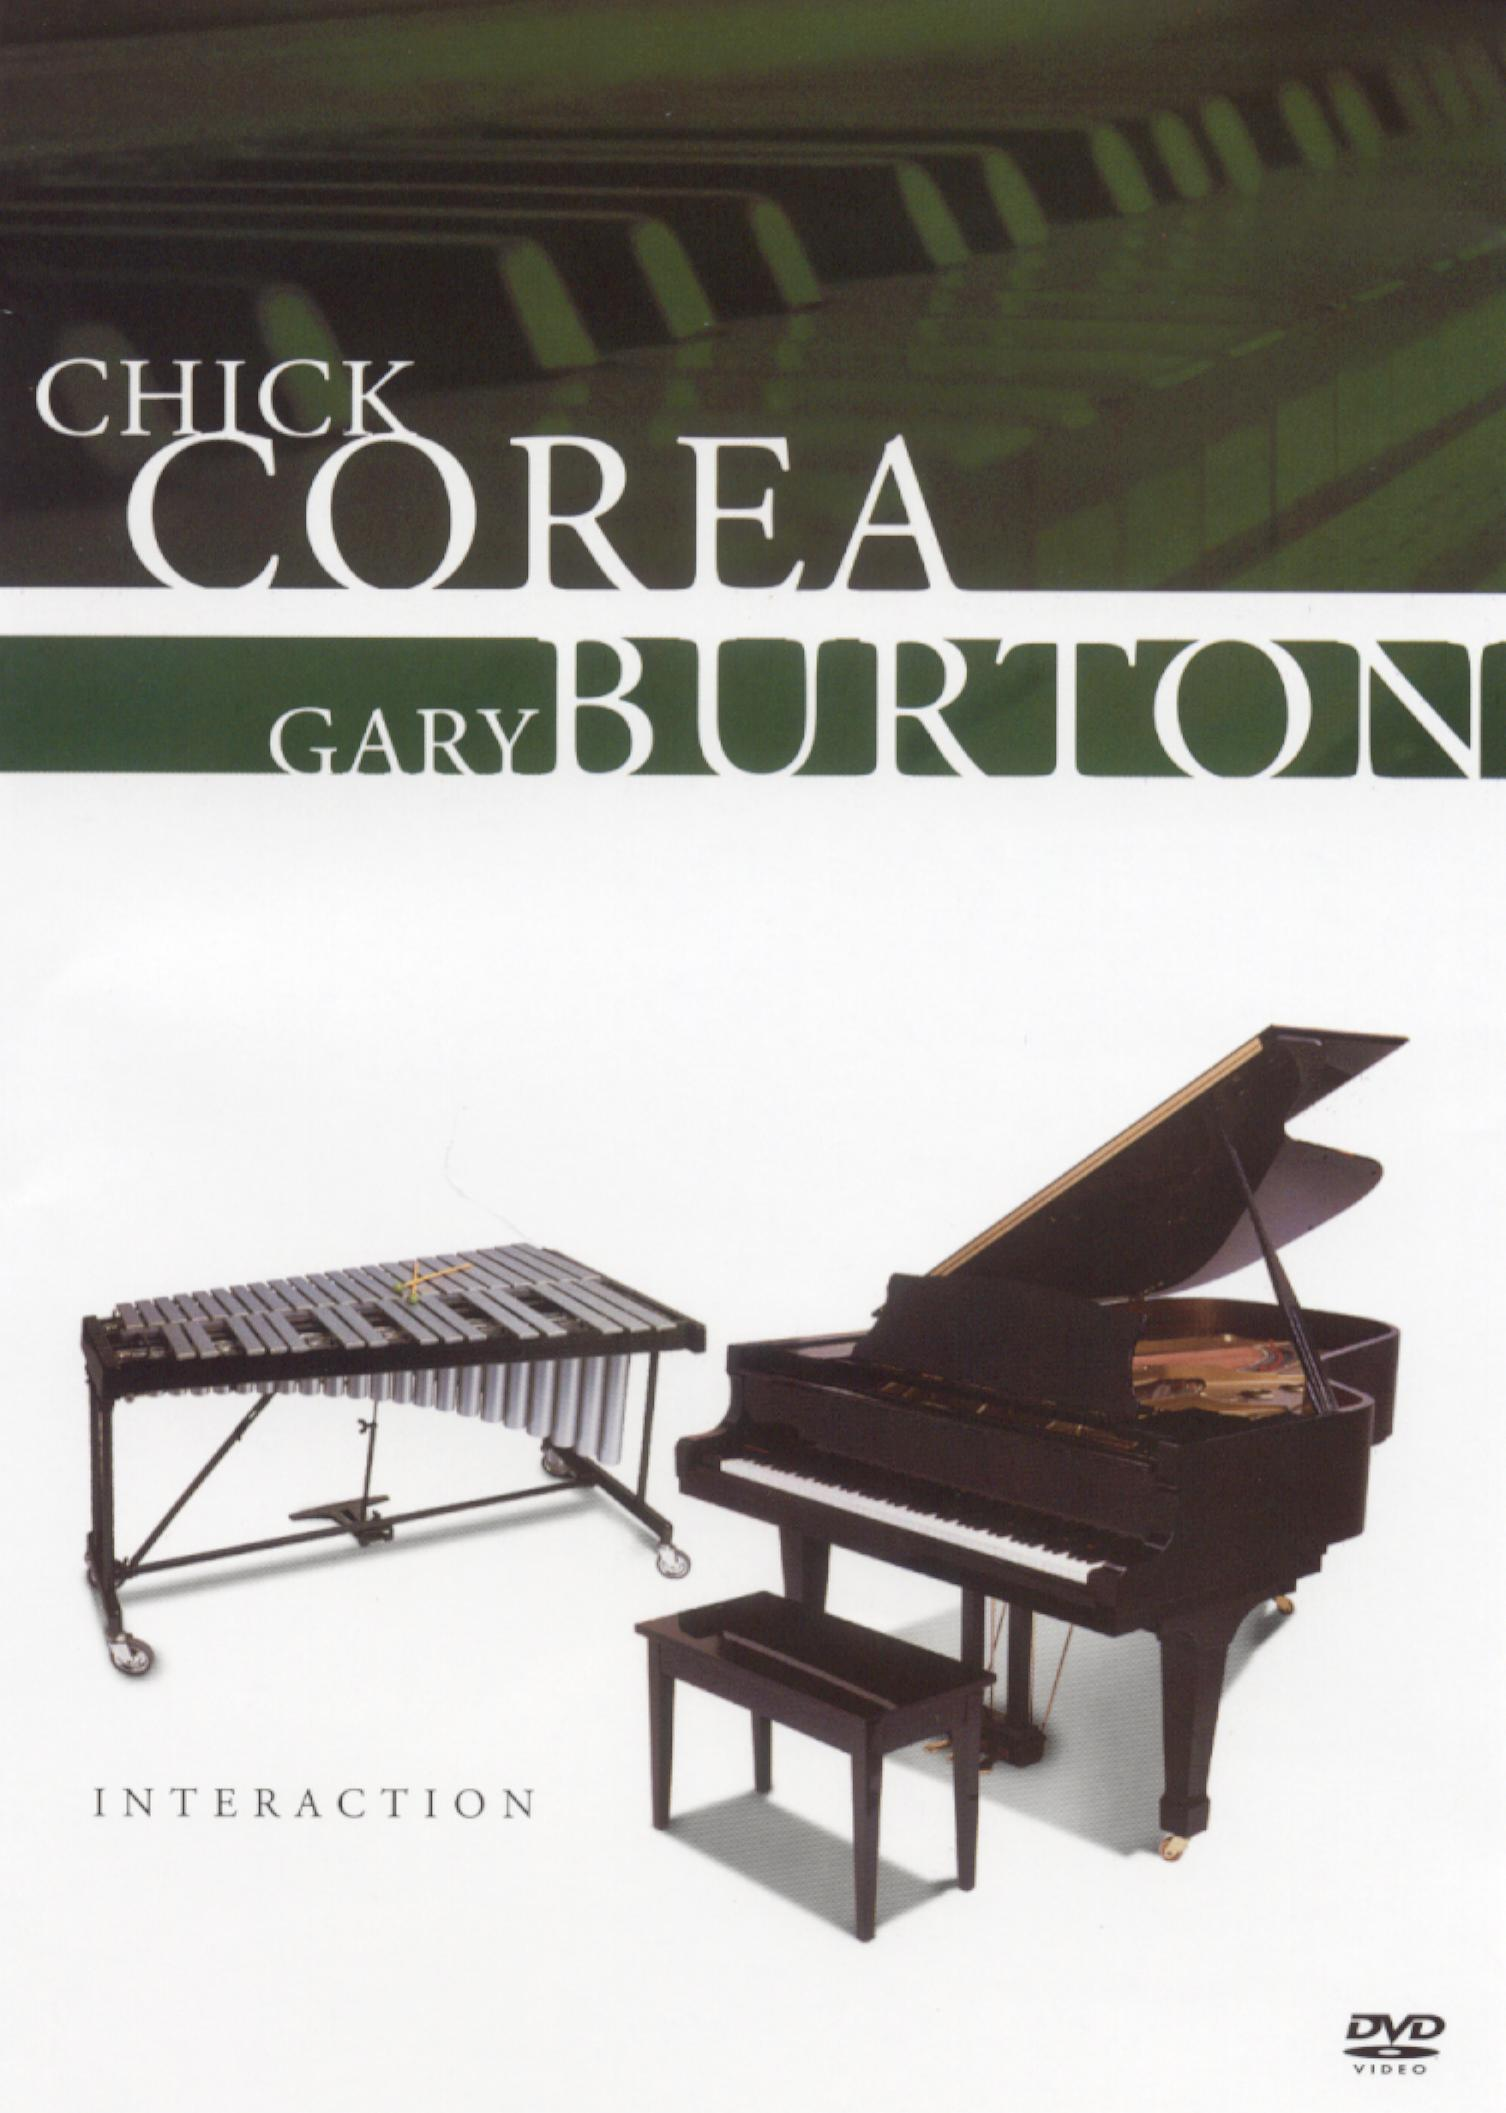 Chick Corea and Gary Burton: Interaction